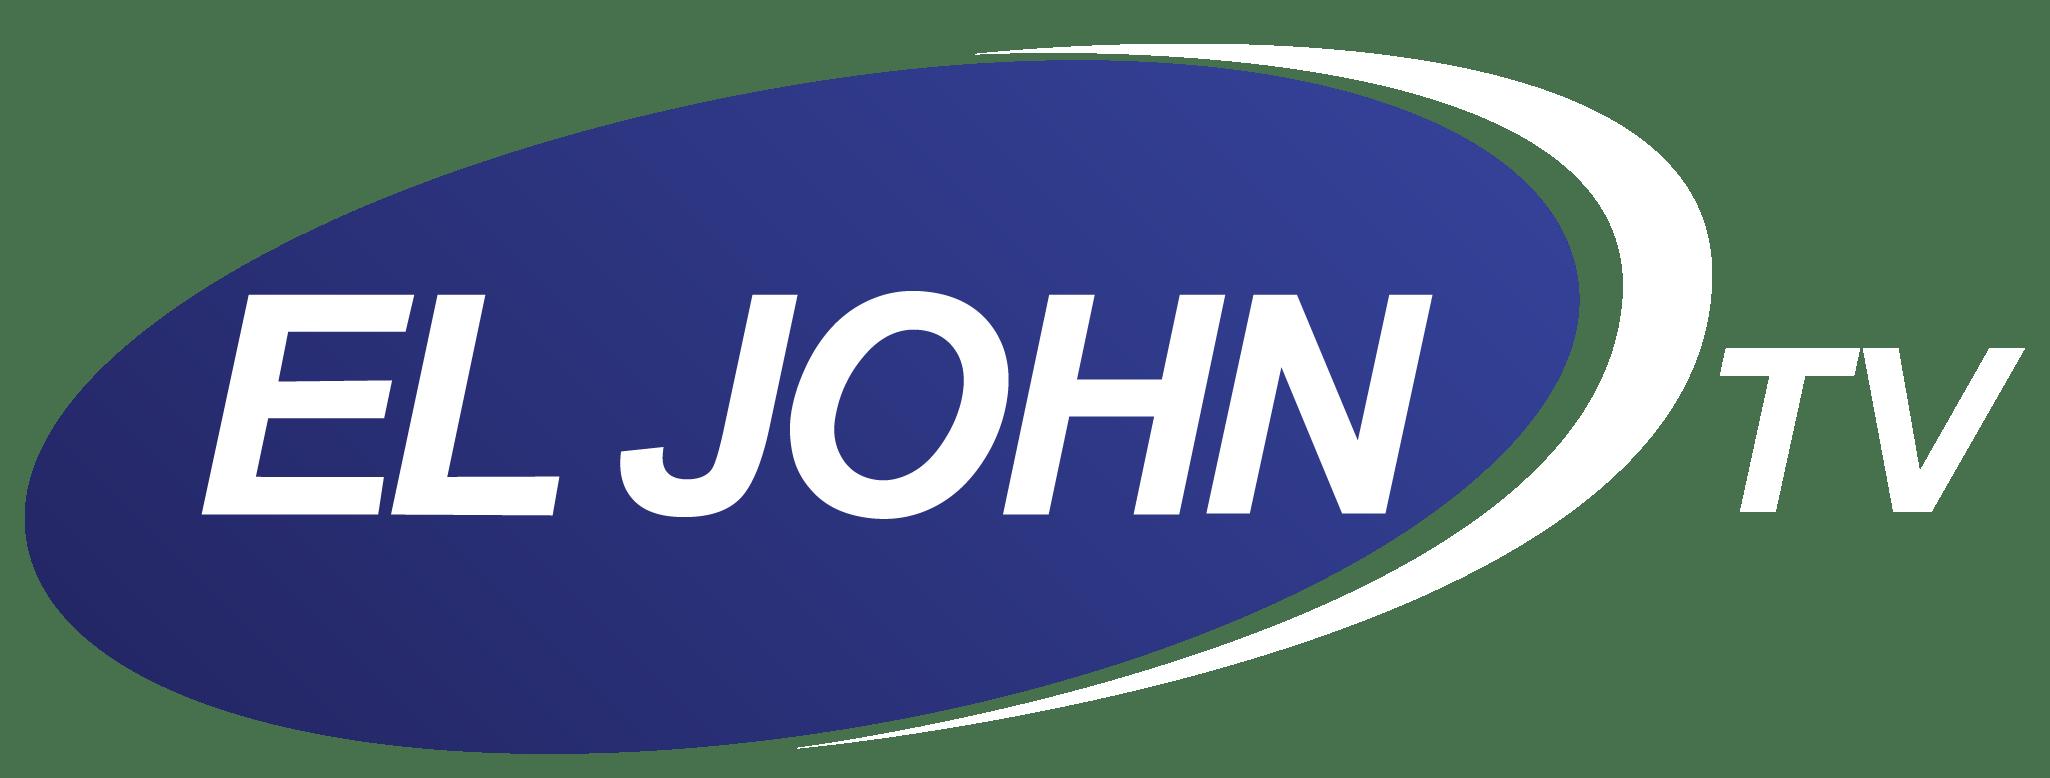 EL John TV